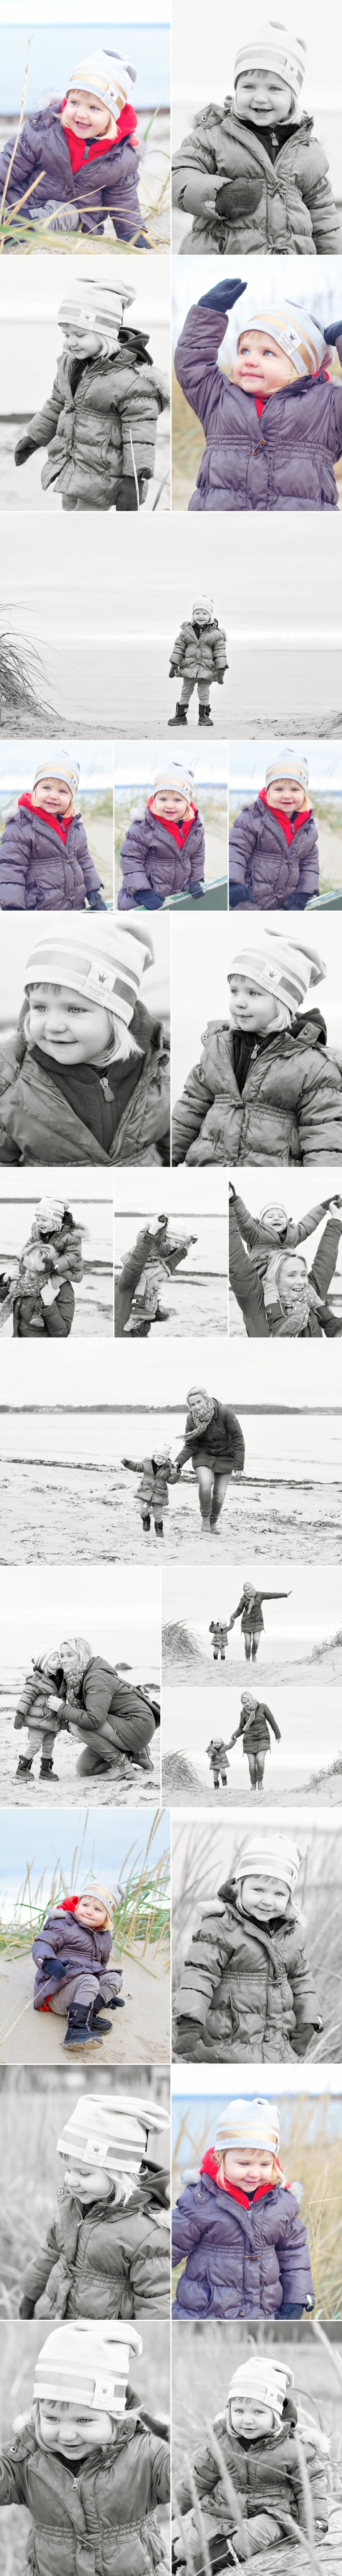 Freya familjefotografering stranden Pernillas Foto